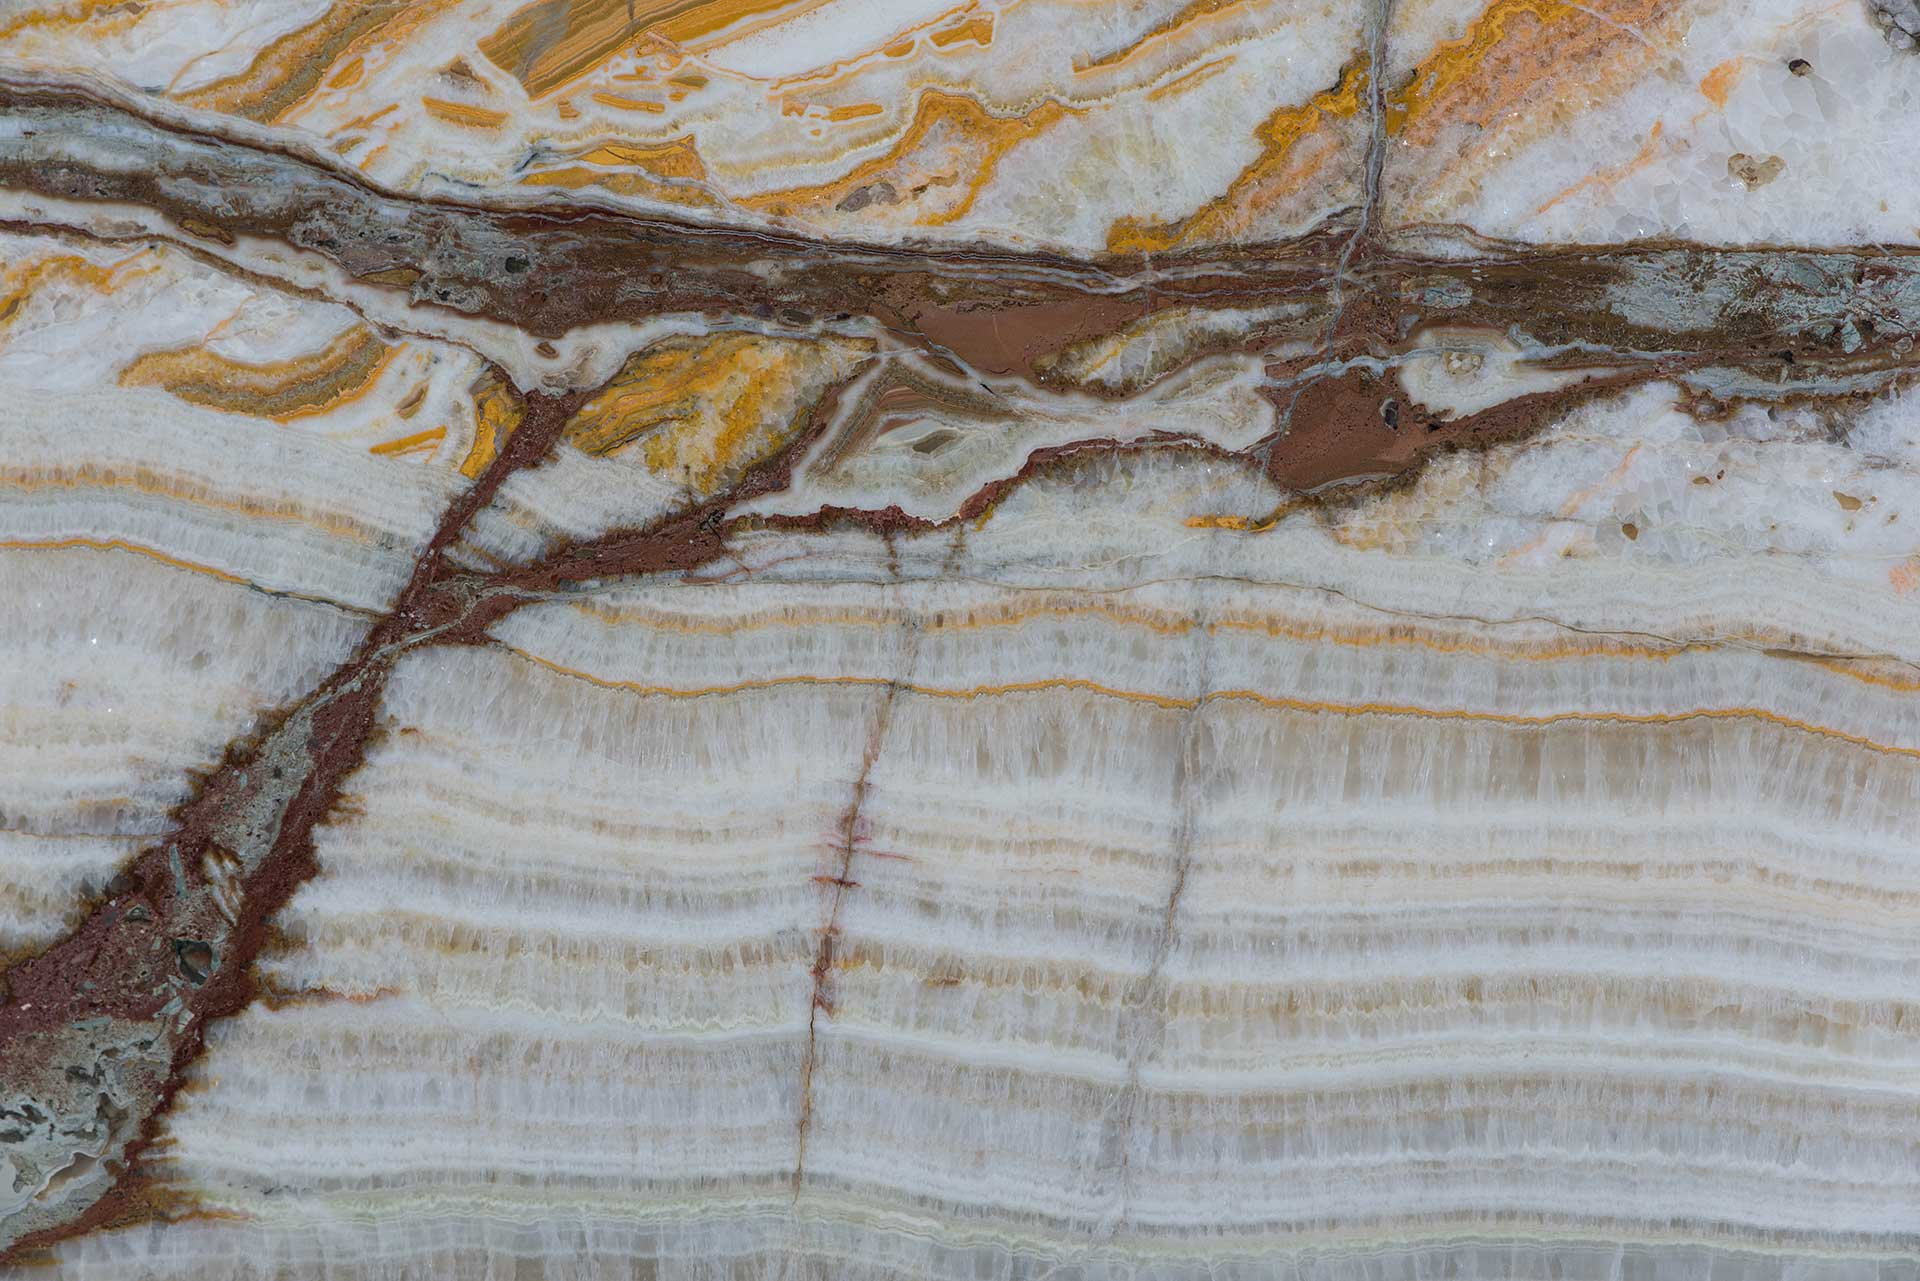 Antler-Onyx-Stone | سنگ مرمر مولتی کالر